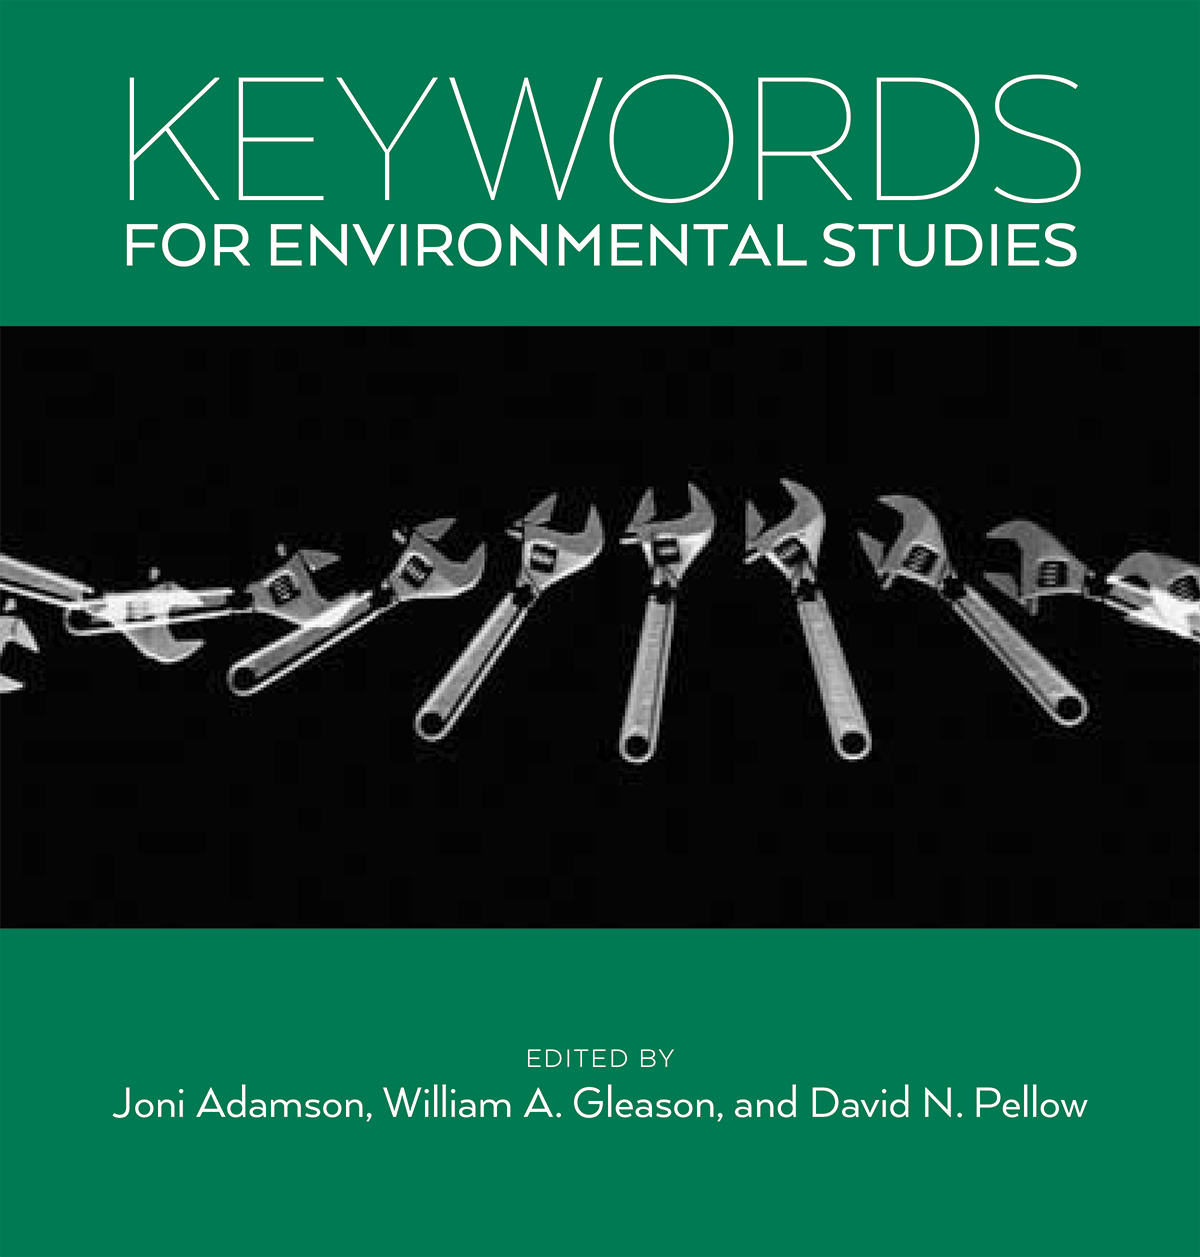 Keywords for Environmental Studies